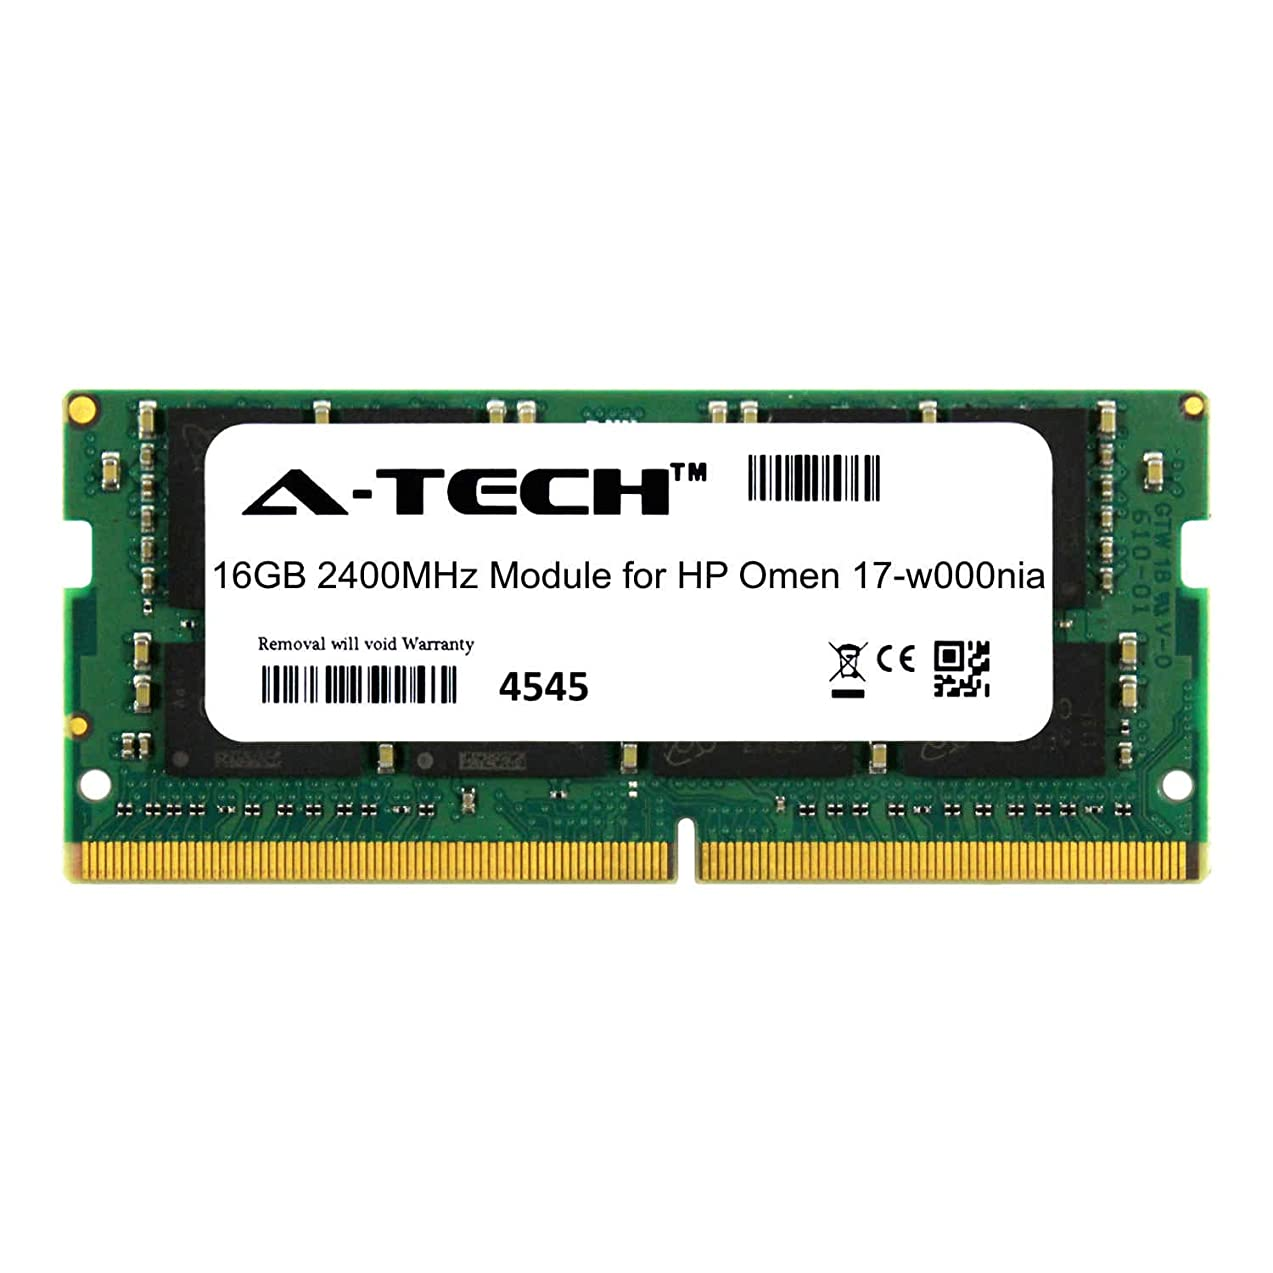 A-Tech 16GB Module for HP Omen 17-w000nia Laptop & Notebook Compatible DDR4 2400Mhz Memory Ram (ATMS281356A25831X1) mzpkphdj326